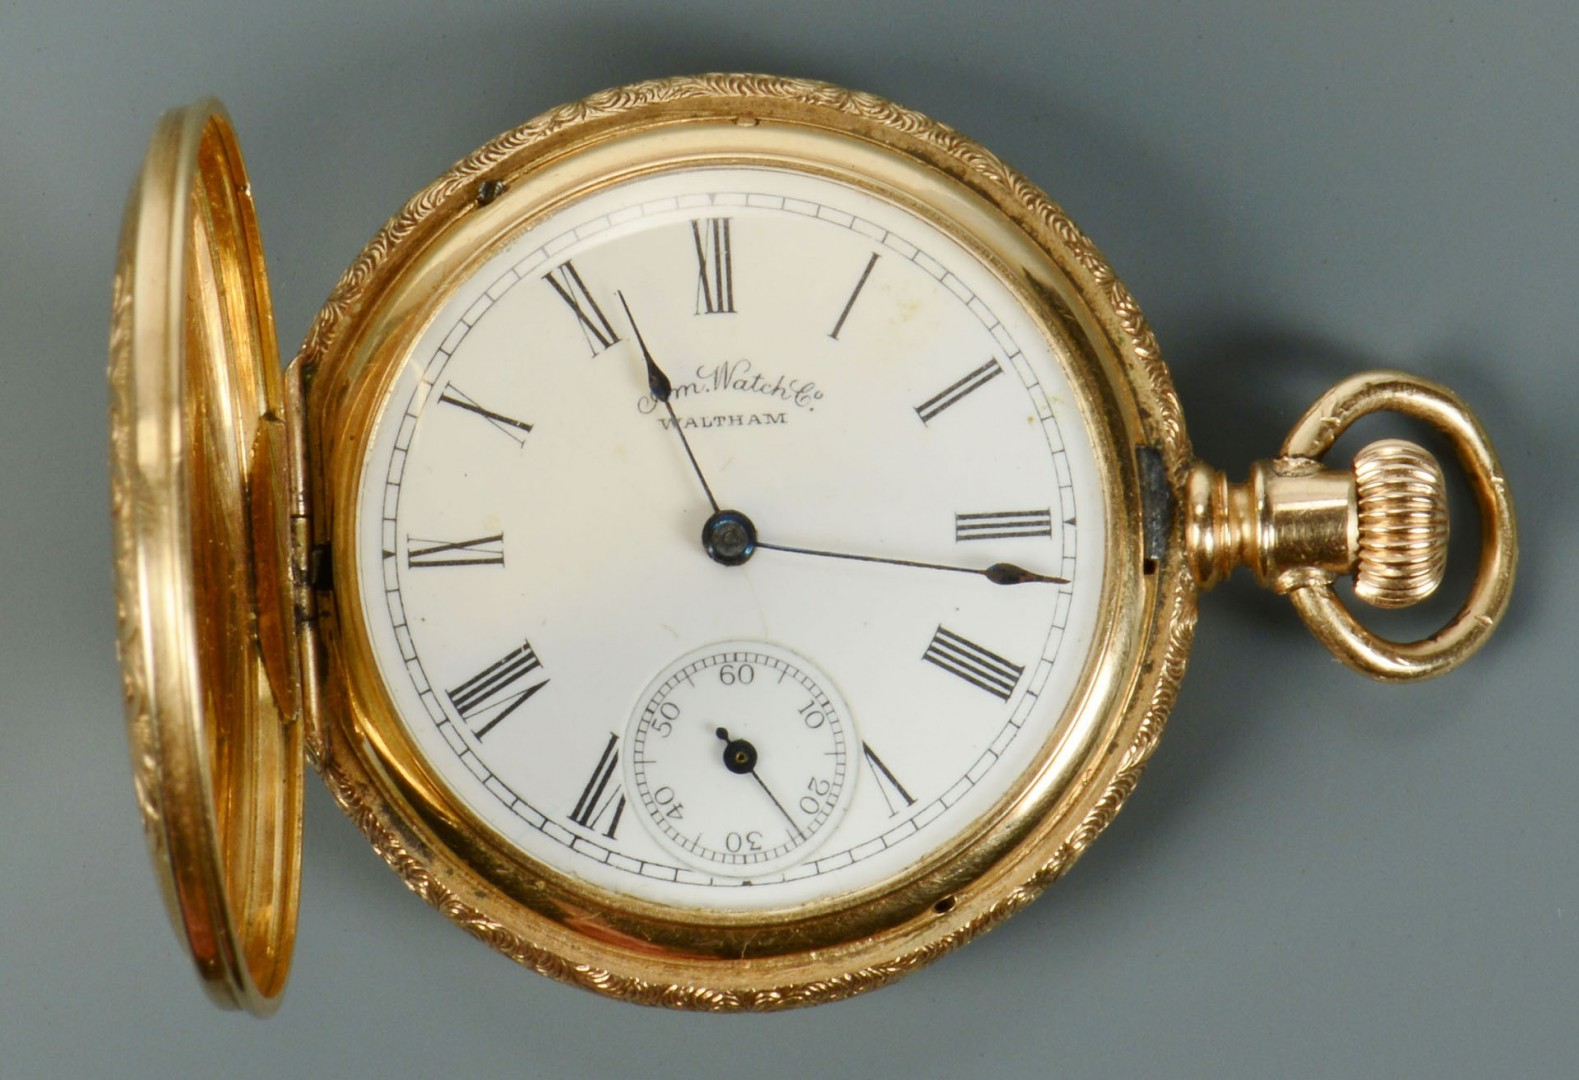 14k ladies Waltham pocket watch